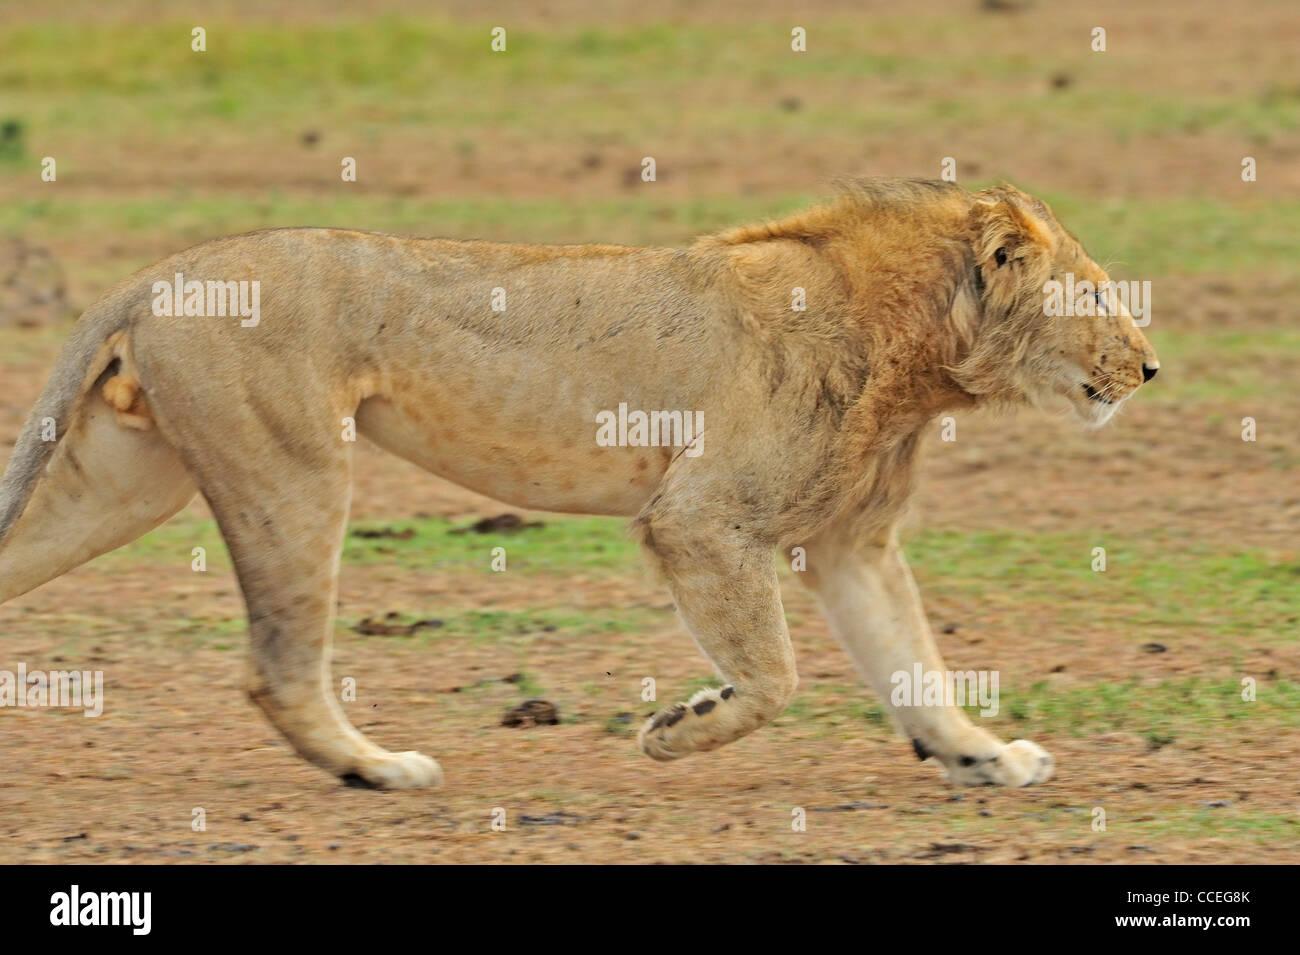 A charging lion in Masai Mara, Kenya, Africa - Stock Image